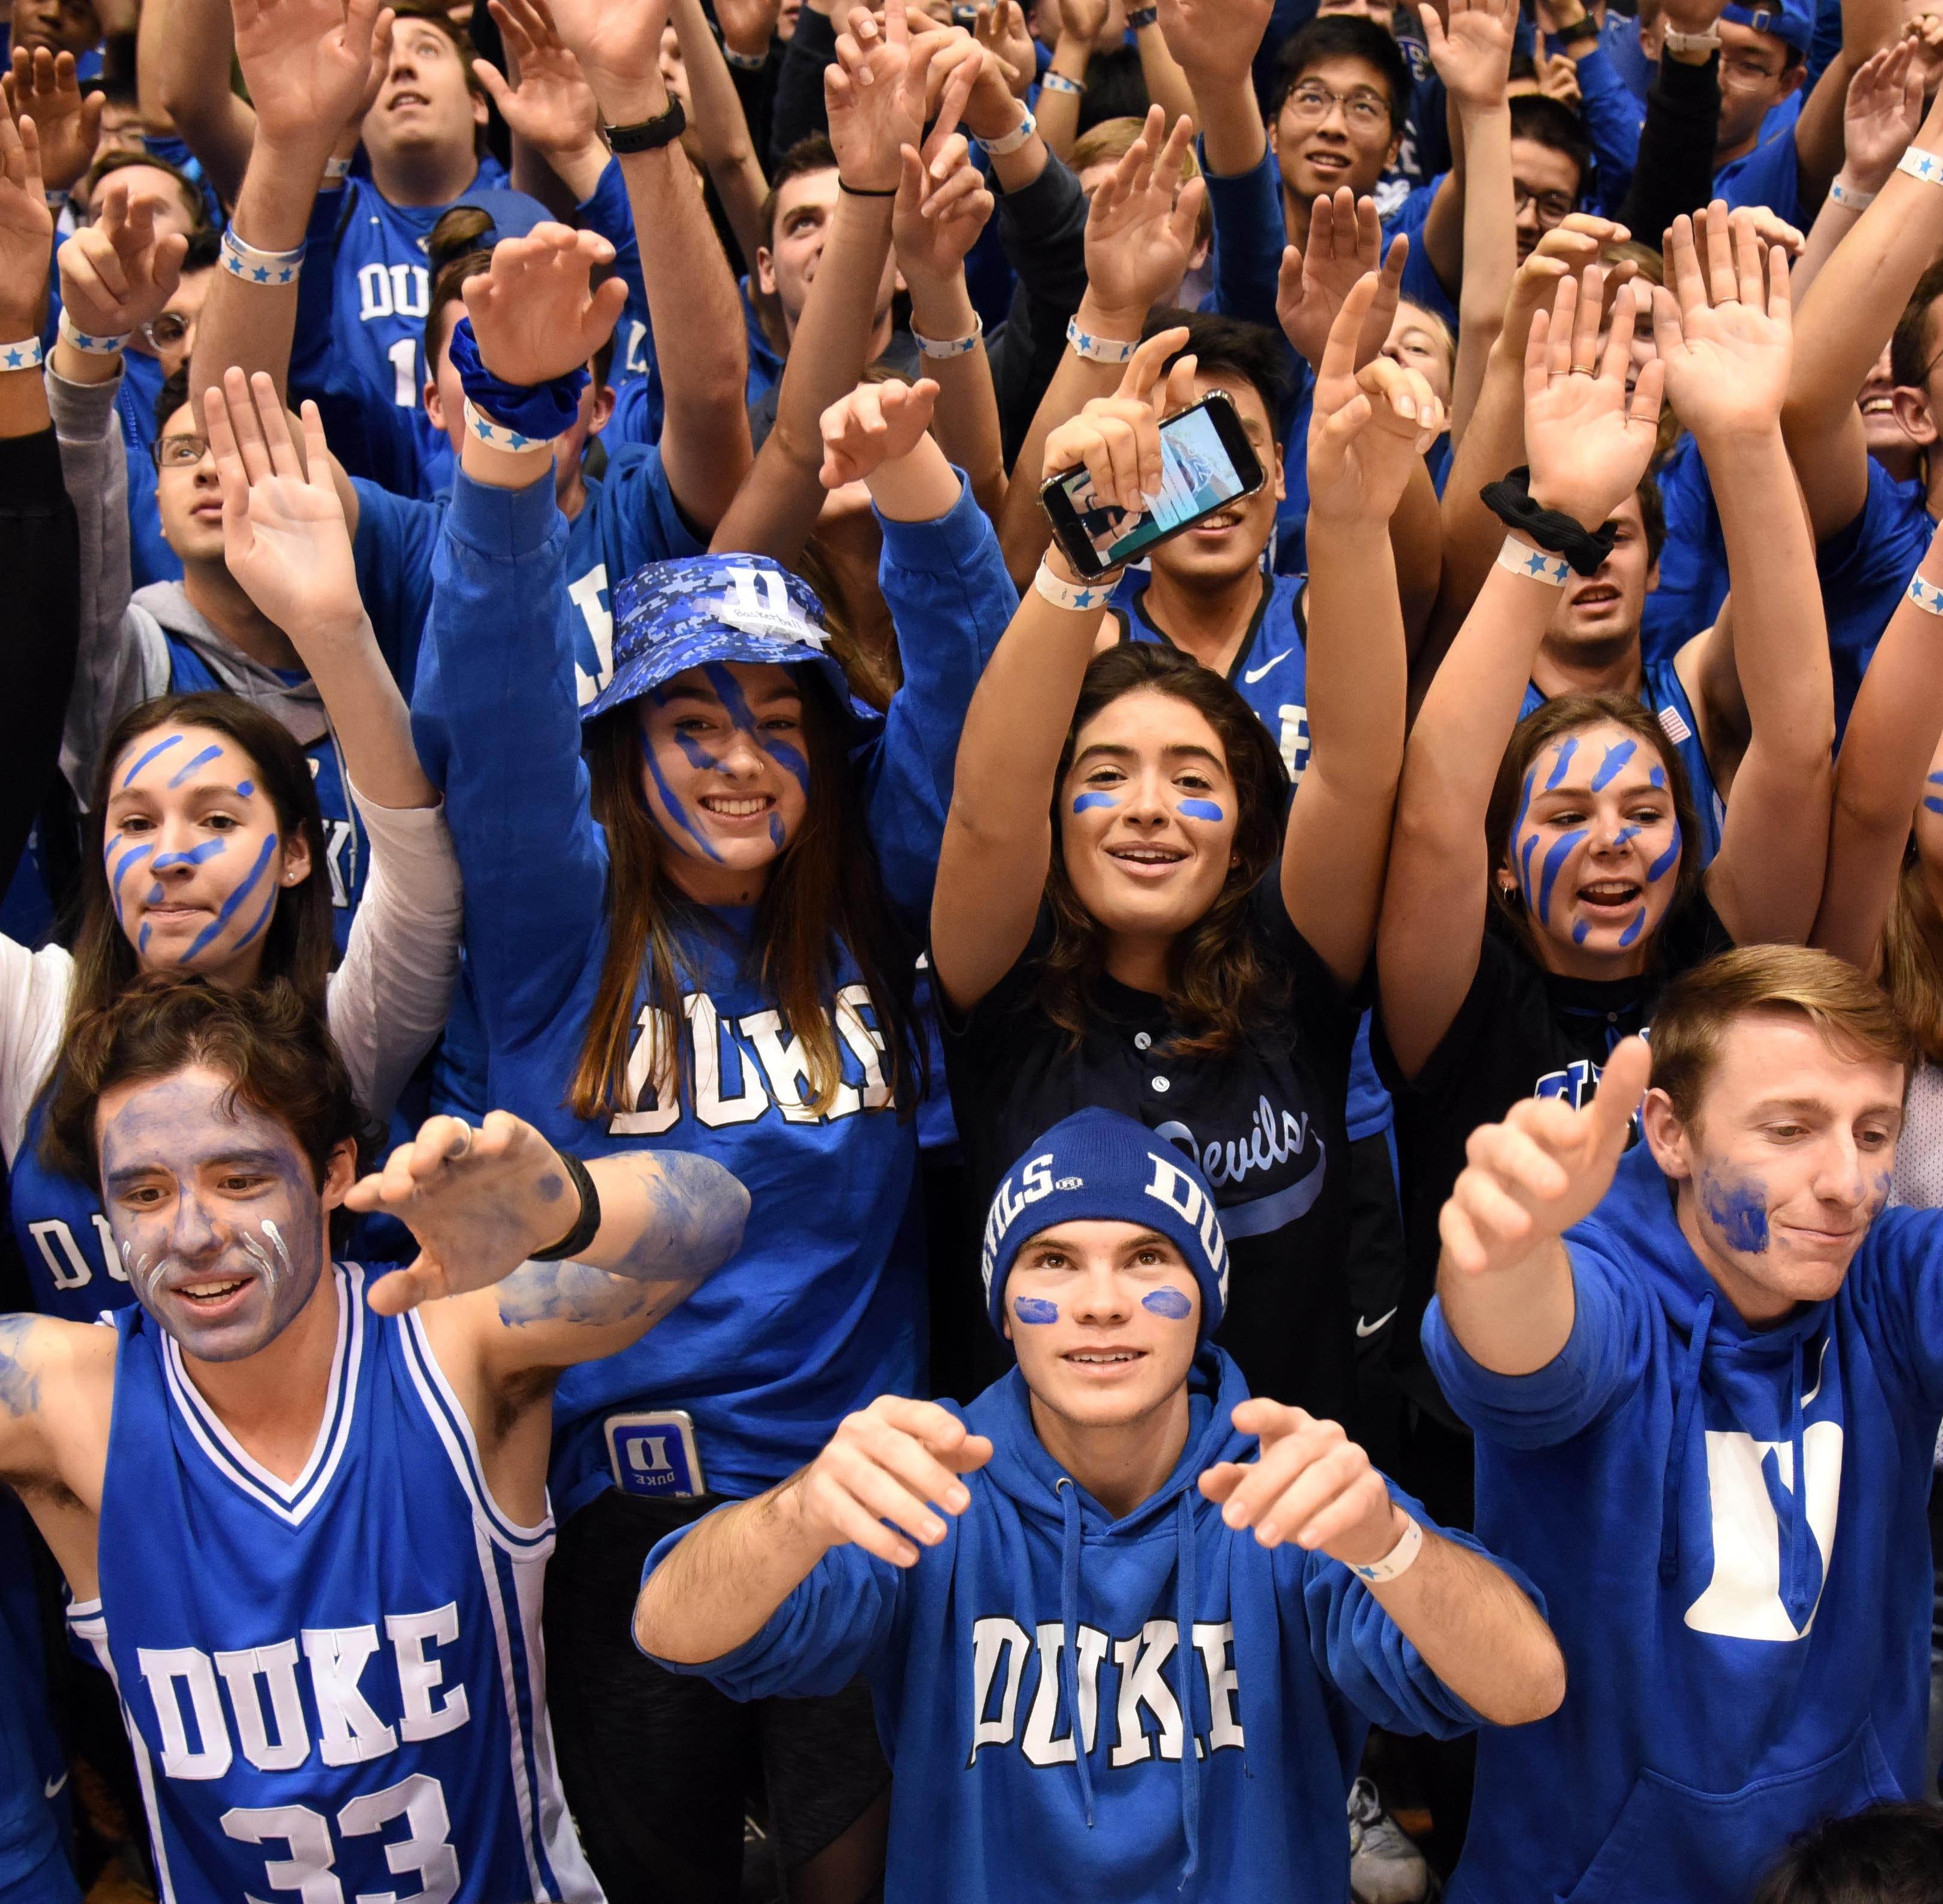 Colorado State basketball team to play at Duke next season